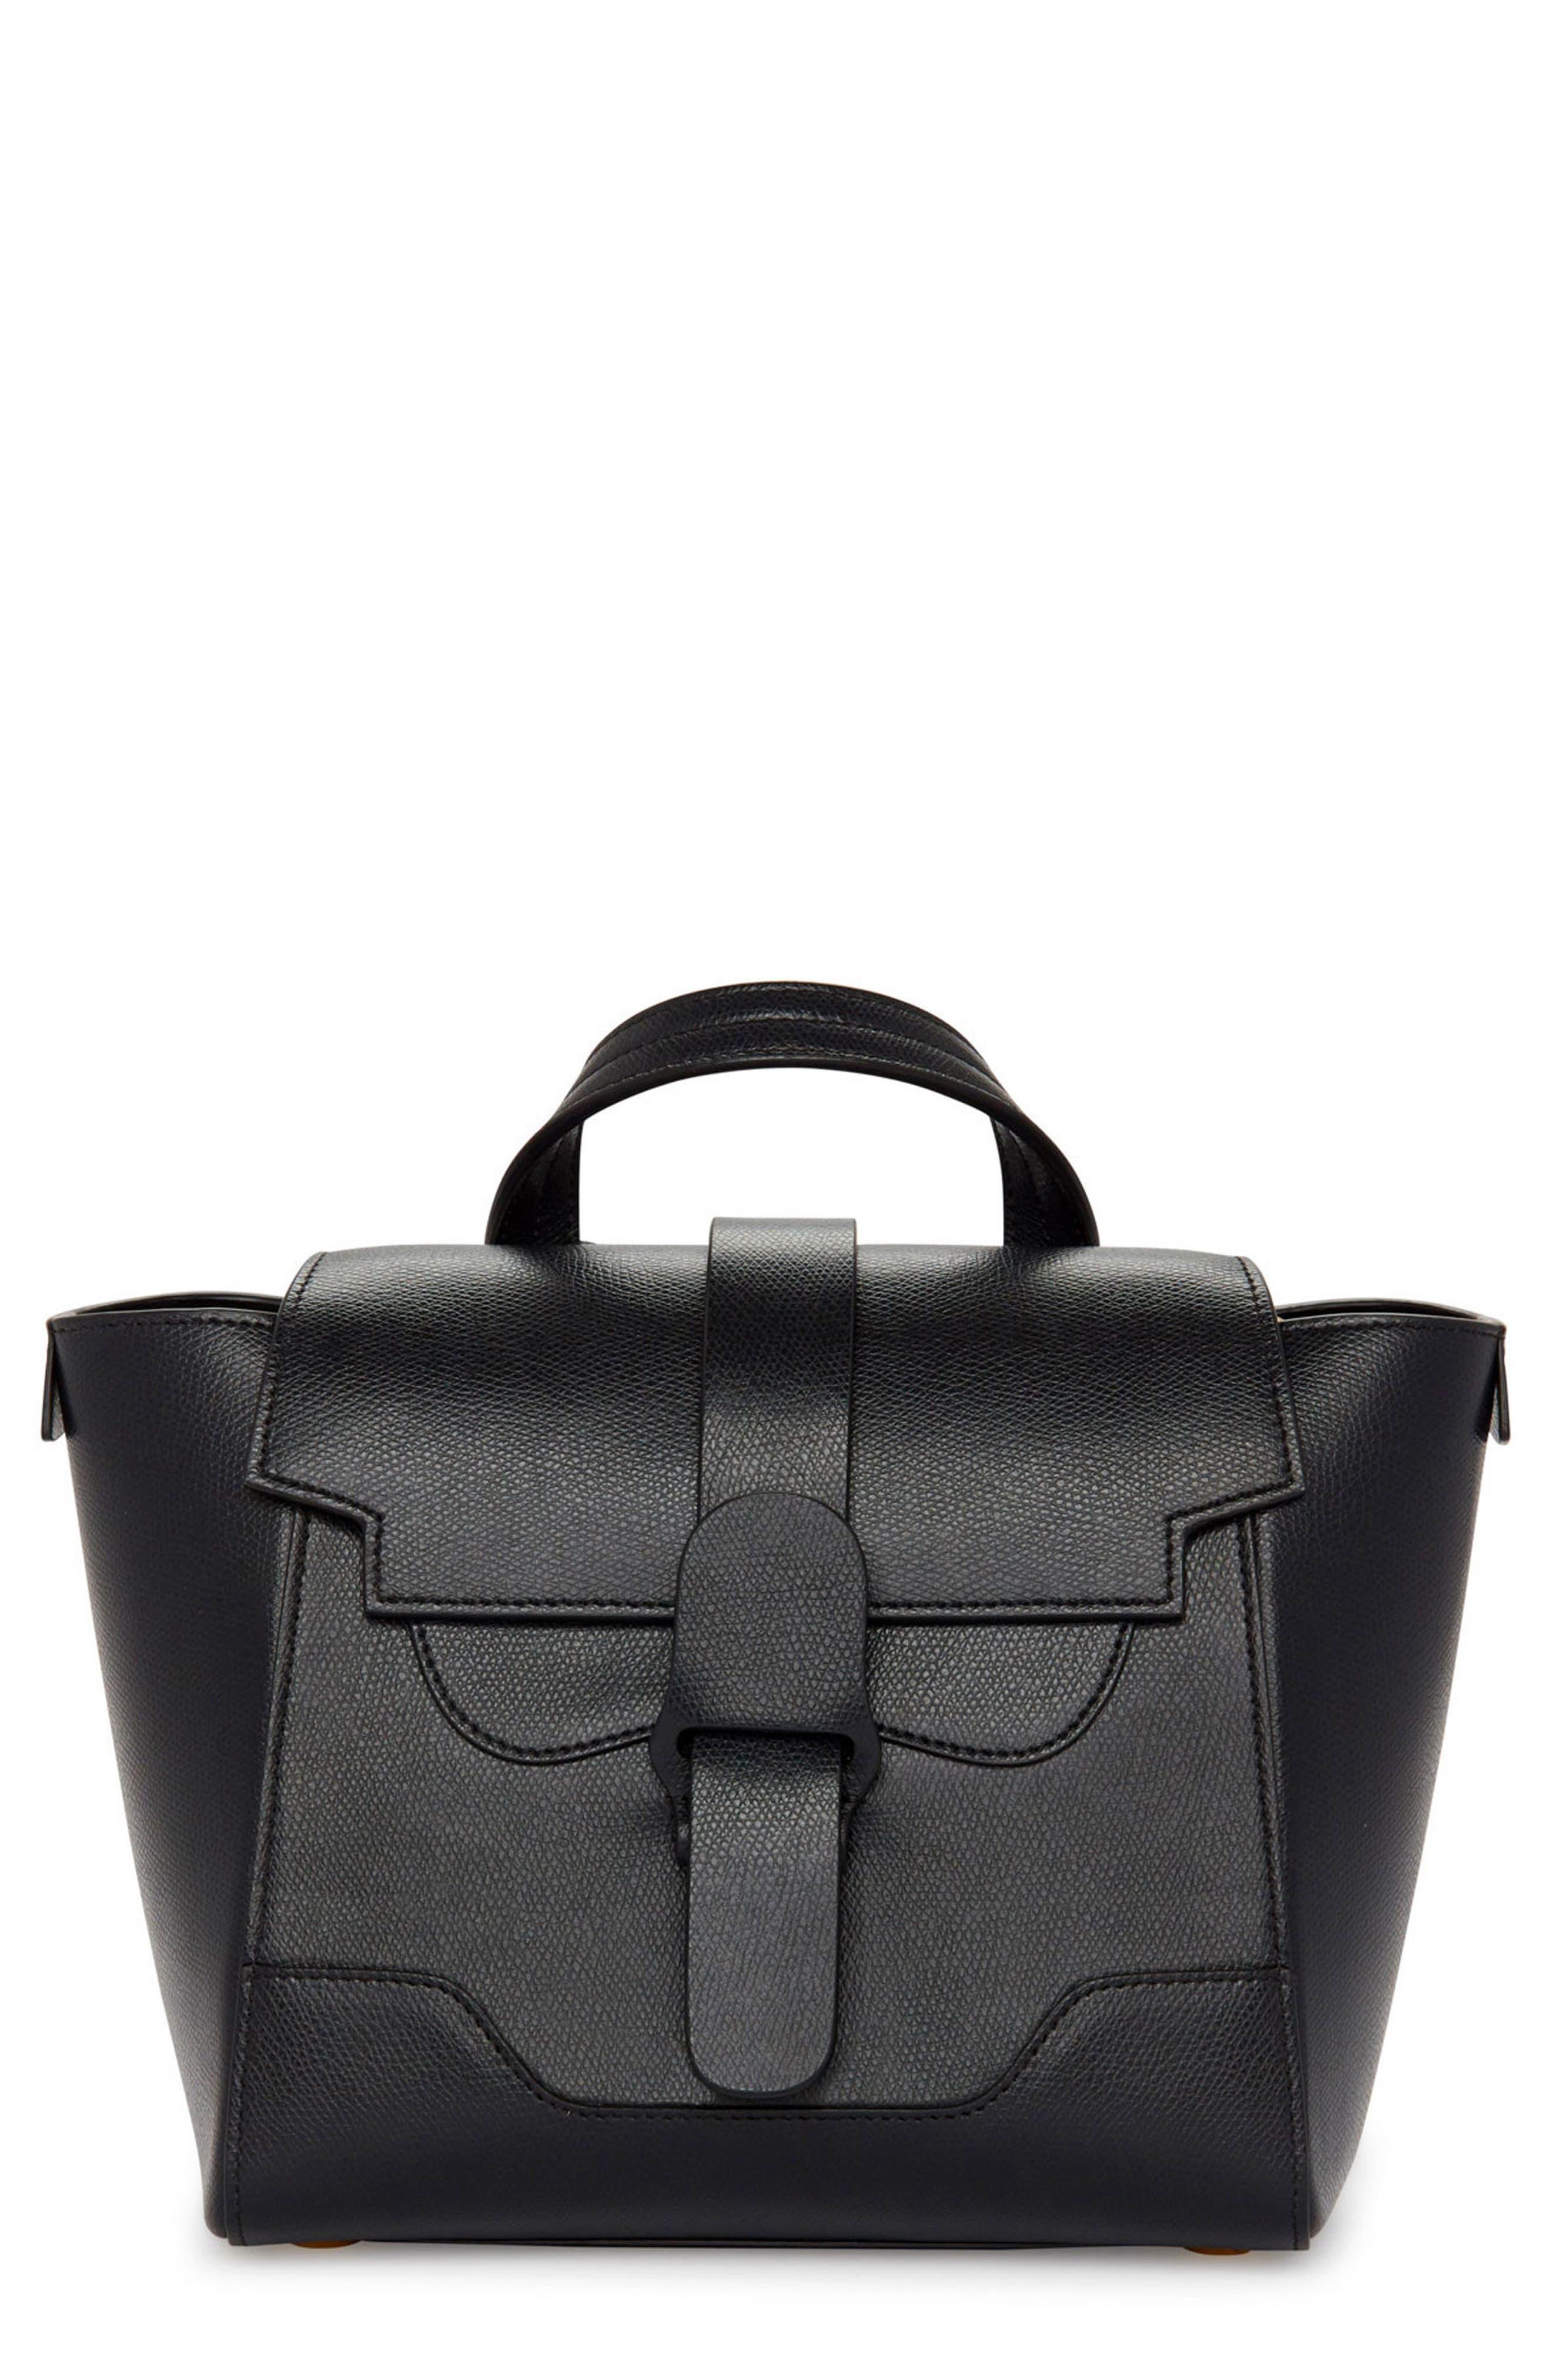 SENREVE Mini Maestra Leather Satchel, Main, color, NOIR